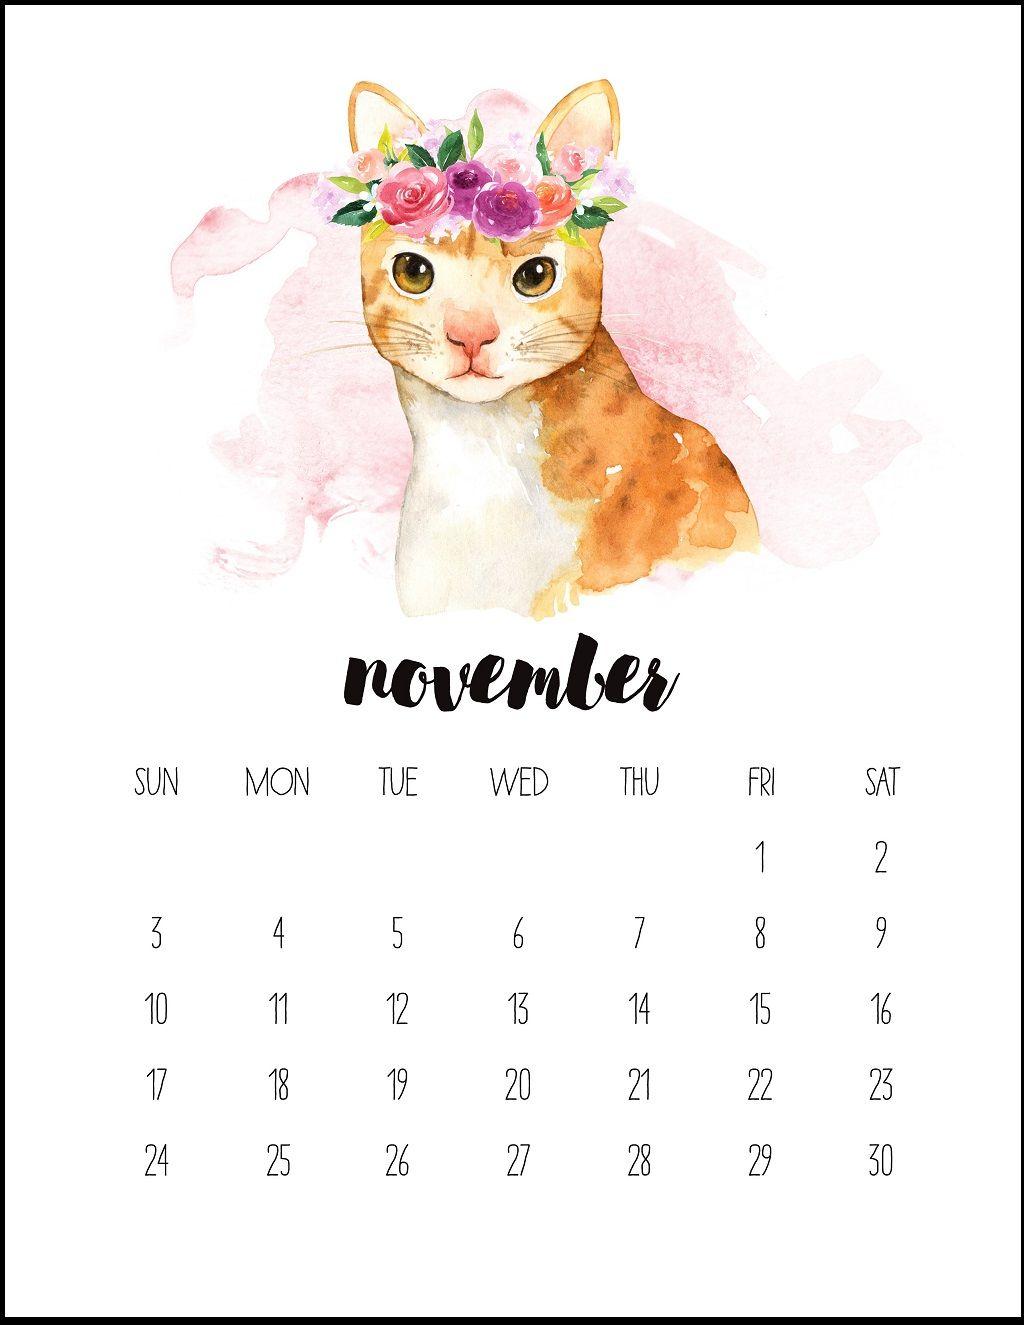 Calendar For November 2019-January 2019 Watercolor November 2019 Printable Calendar. | IG POST | November